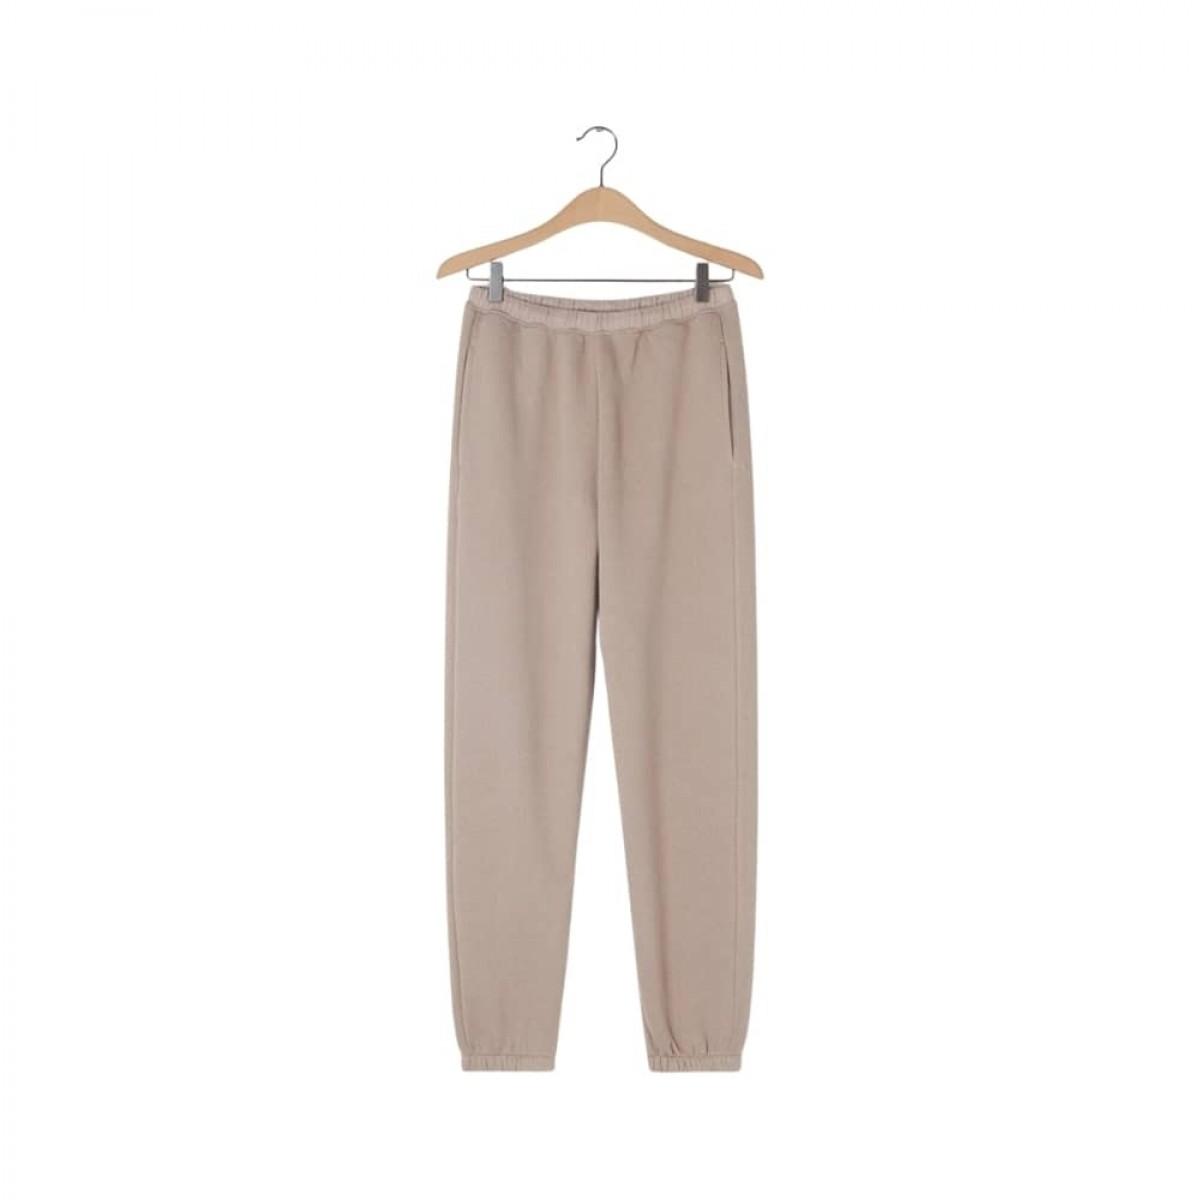 ikatown sweat bukser - taupe